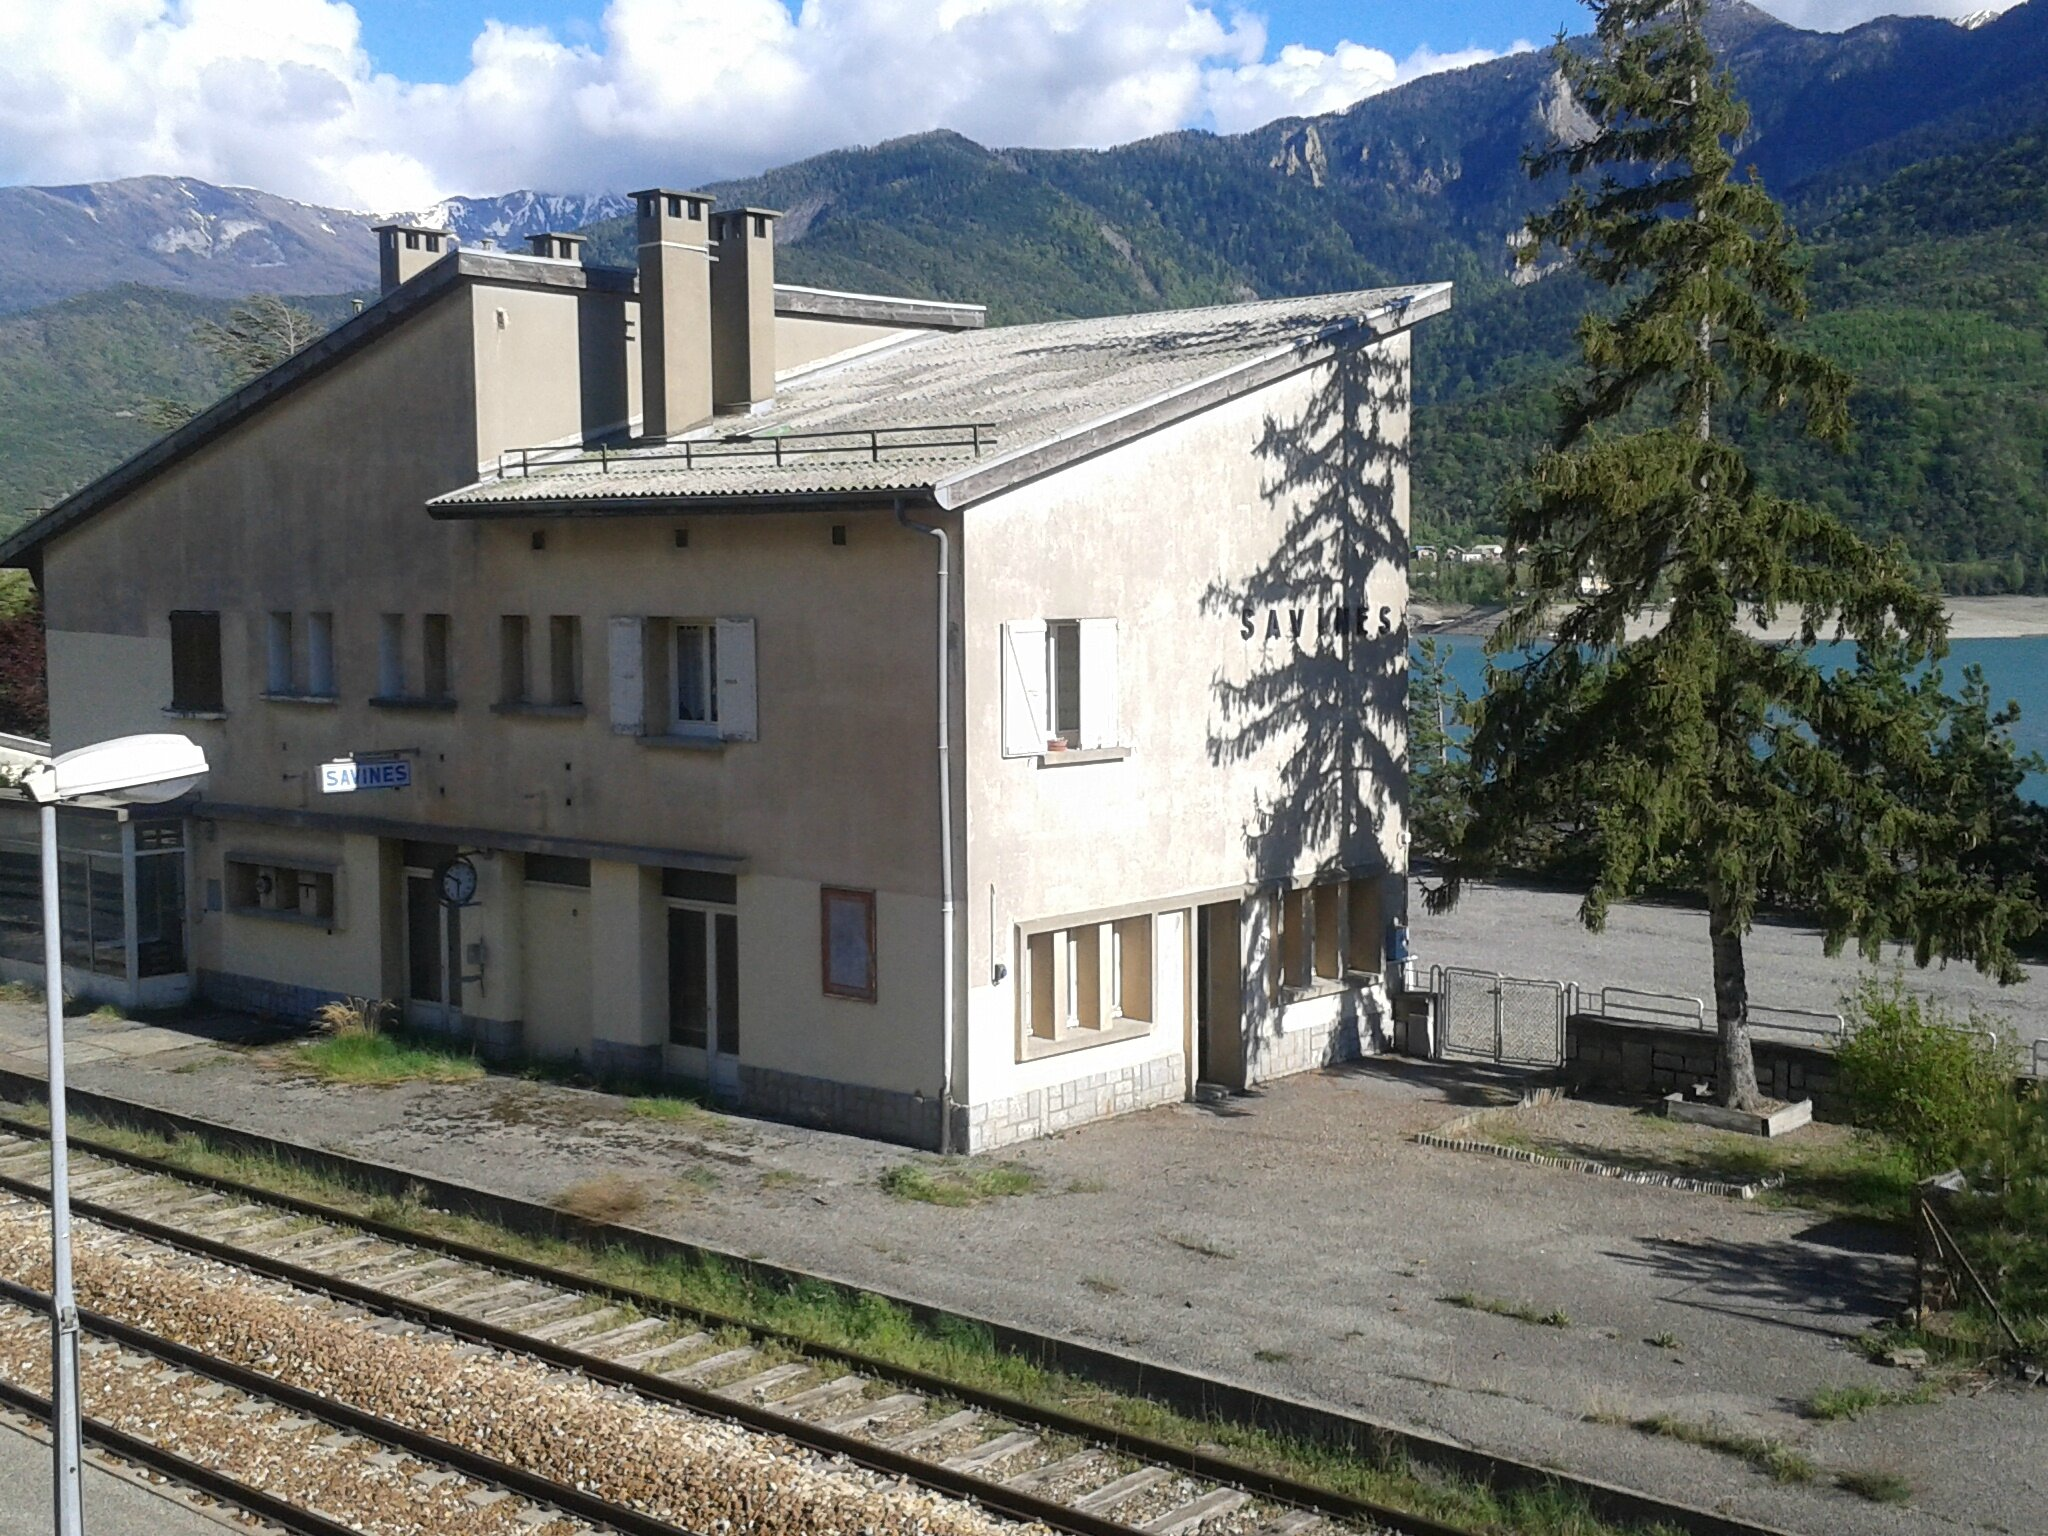 Savines-Le-Lac (Hautes-Alpes - 05) 1